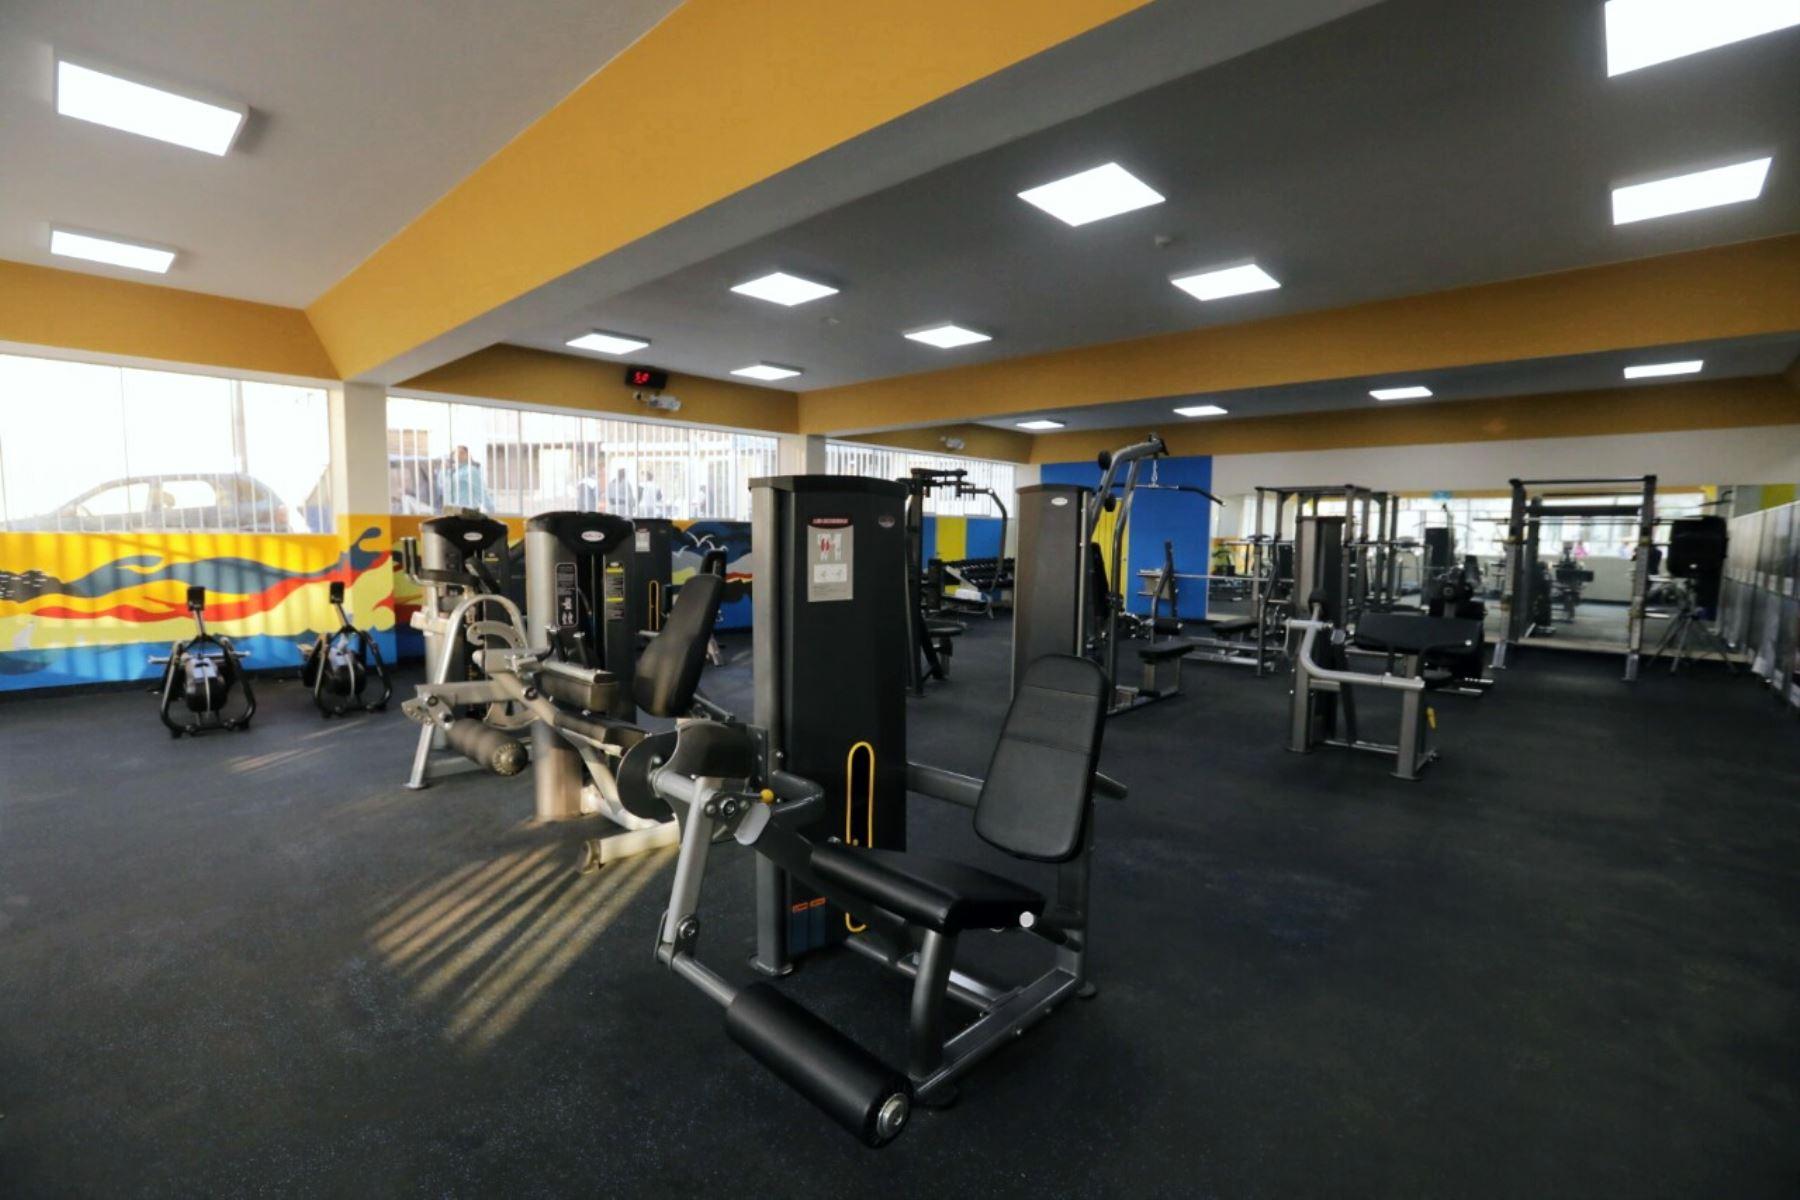 Municipio de Lima inauguró gimnasio para los vecinos de Barrios Altos. Foto: ANDINA/Difusión.